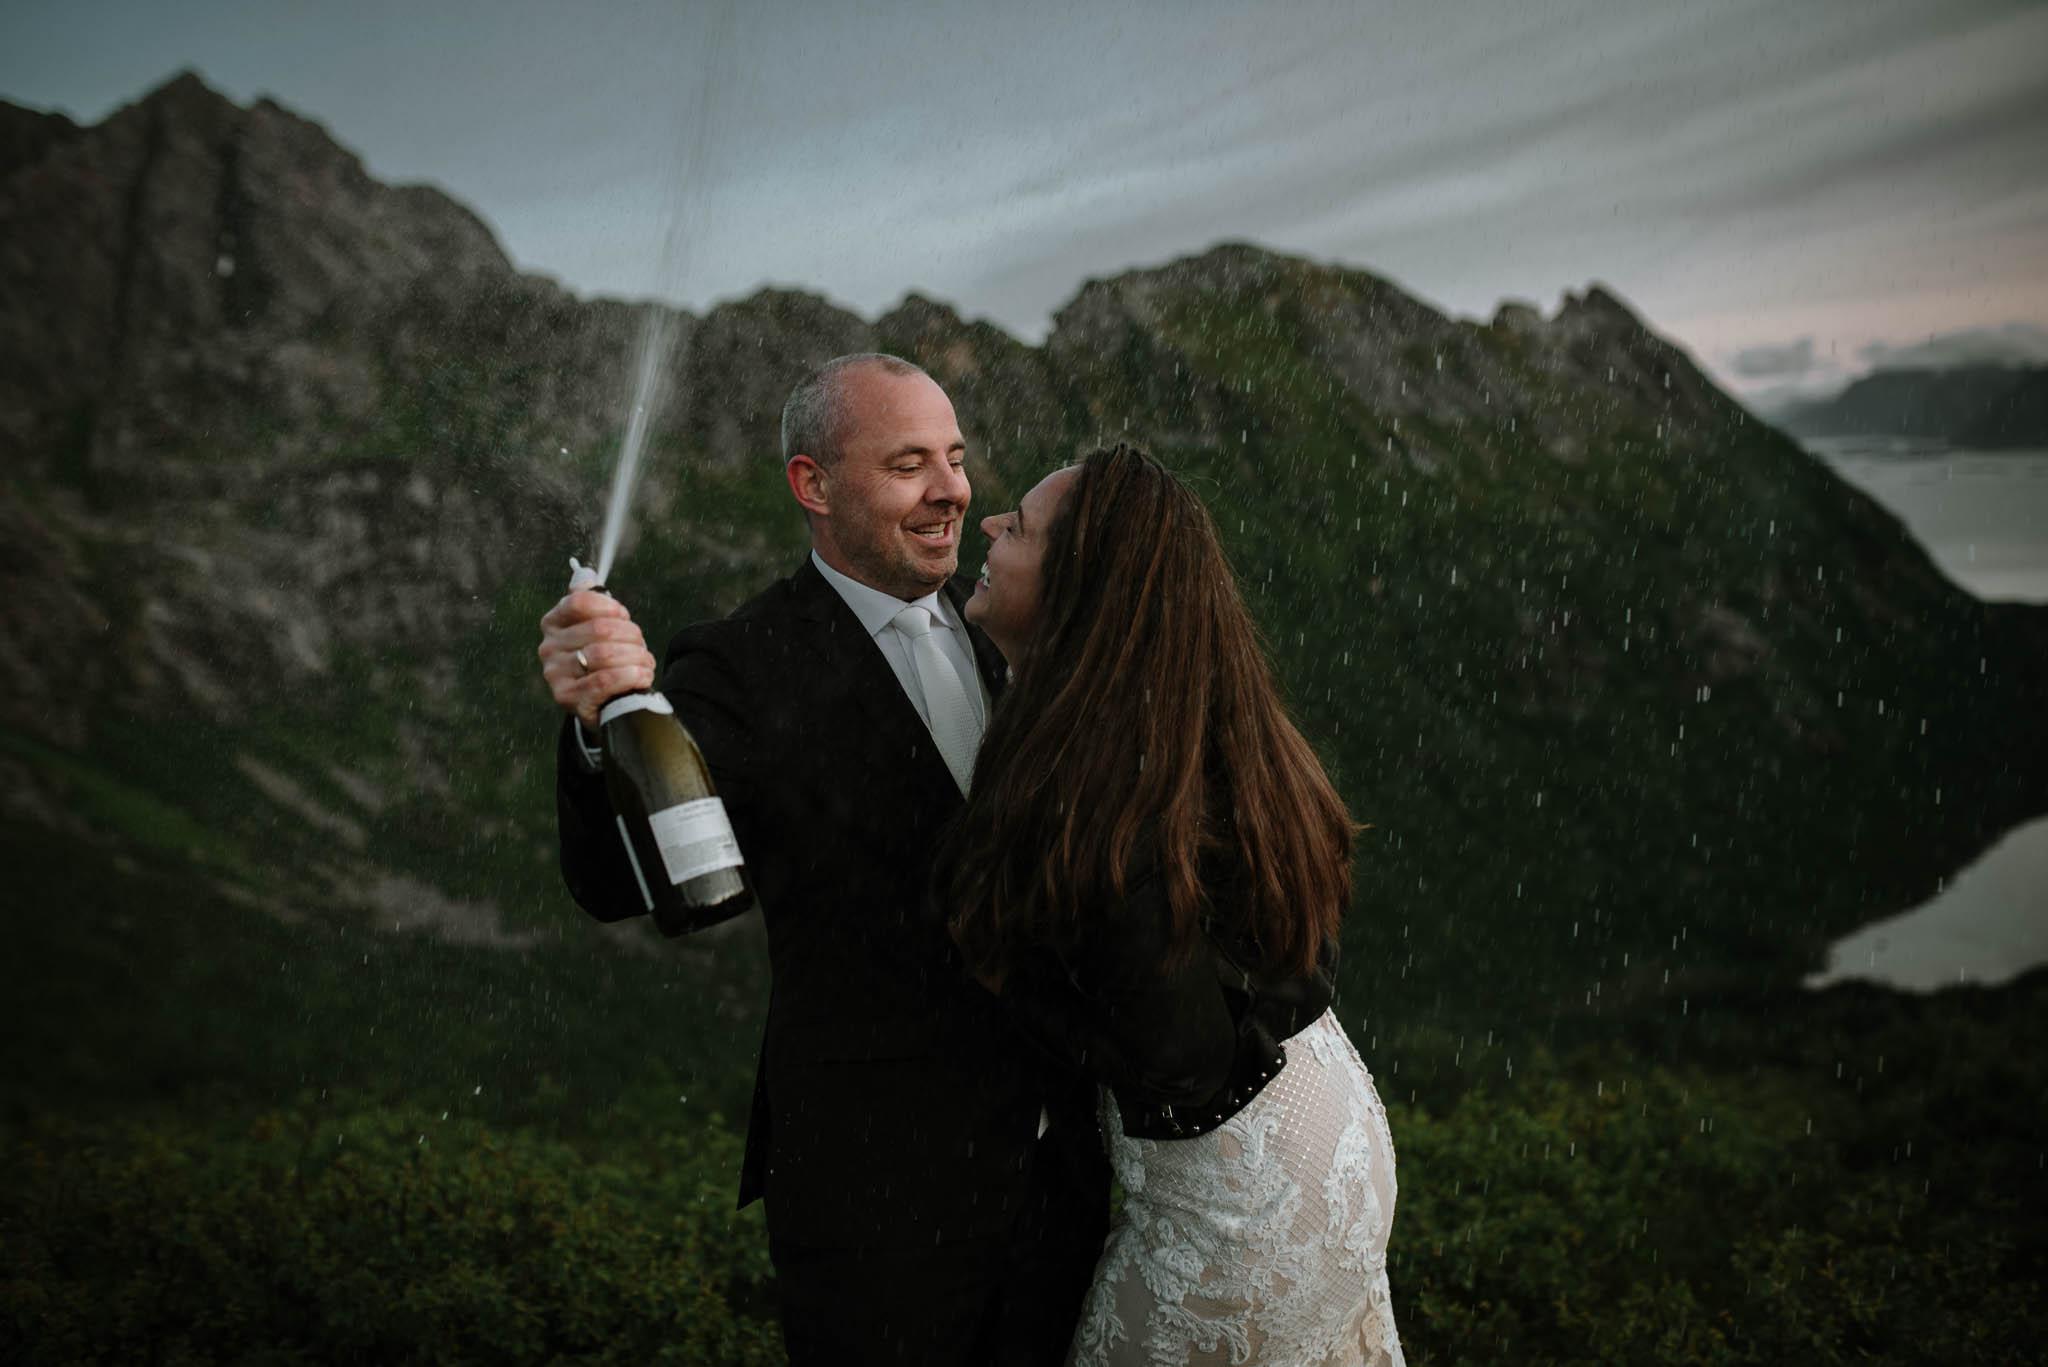 Bryllupsfotograf i Lofoten - wedding photographer Lofoten - bryllup harstad-87.jpg